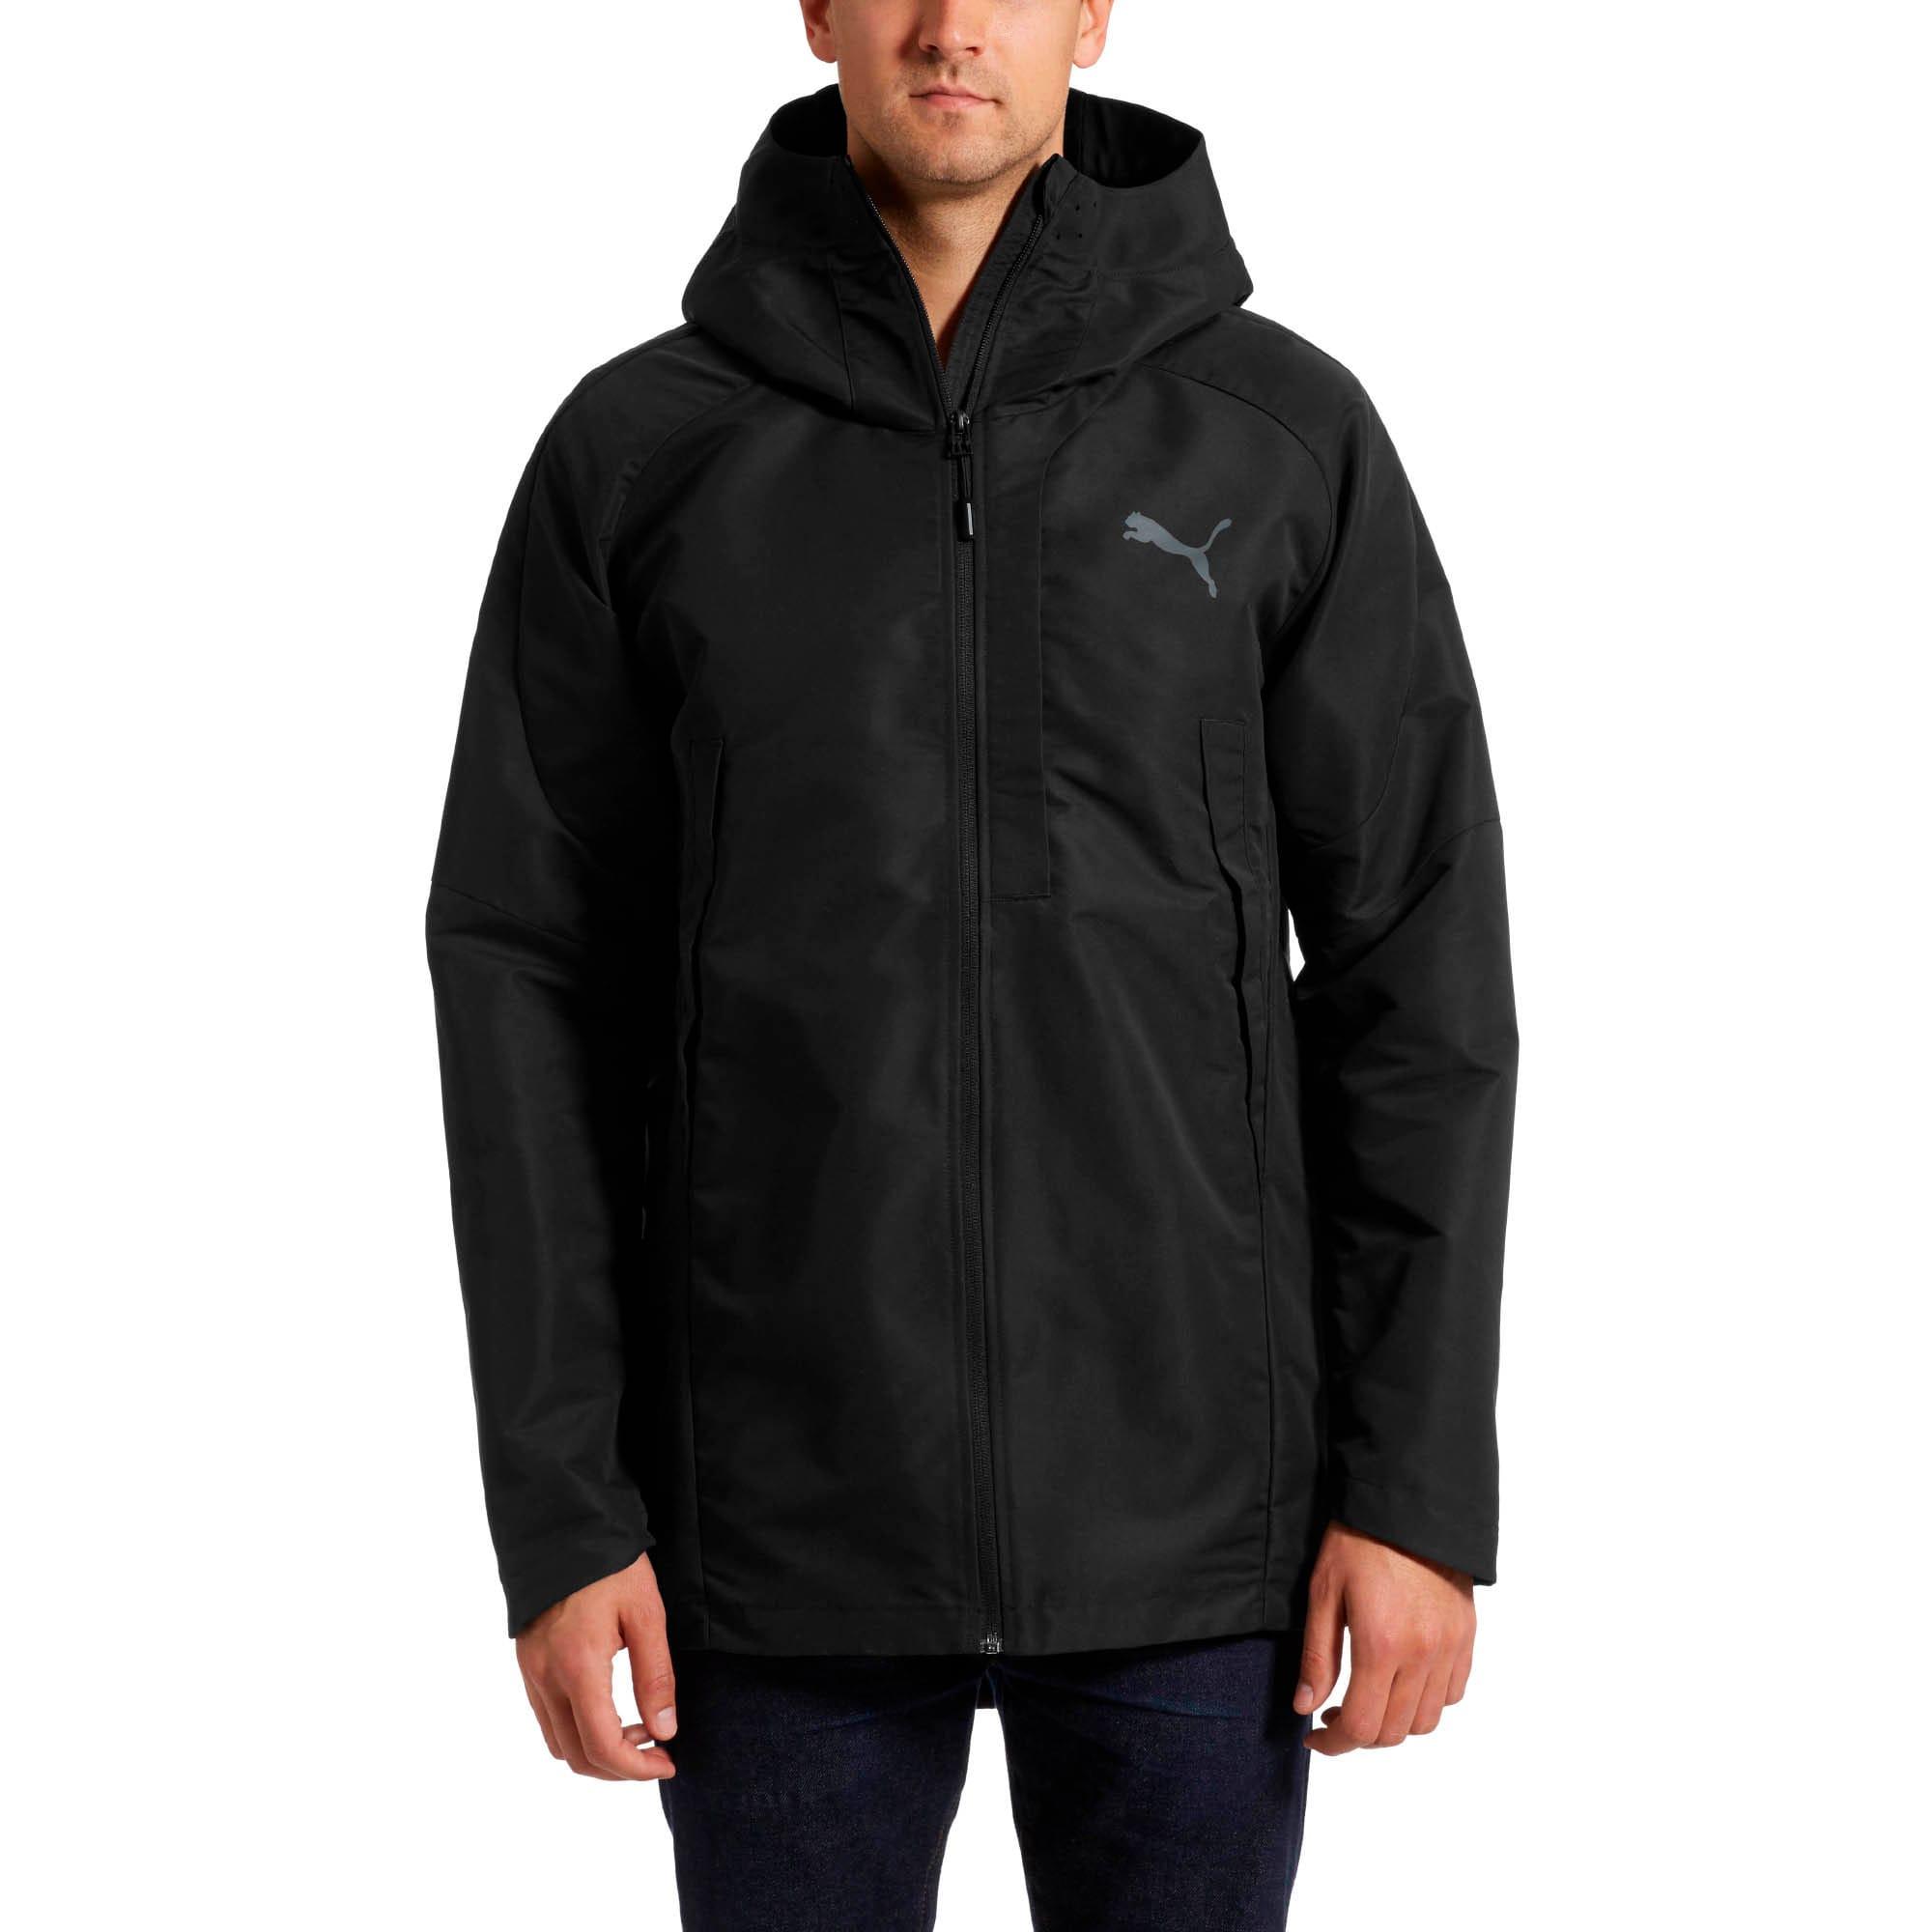 Thumbnail 2 of Mobility Men's Jacket, Puma Black, medium